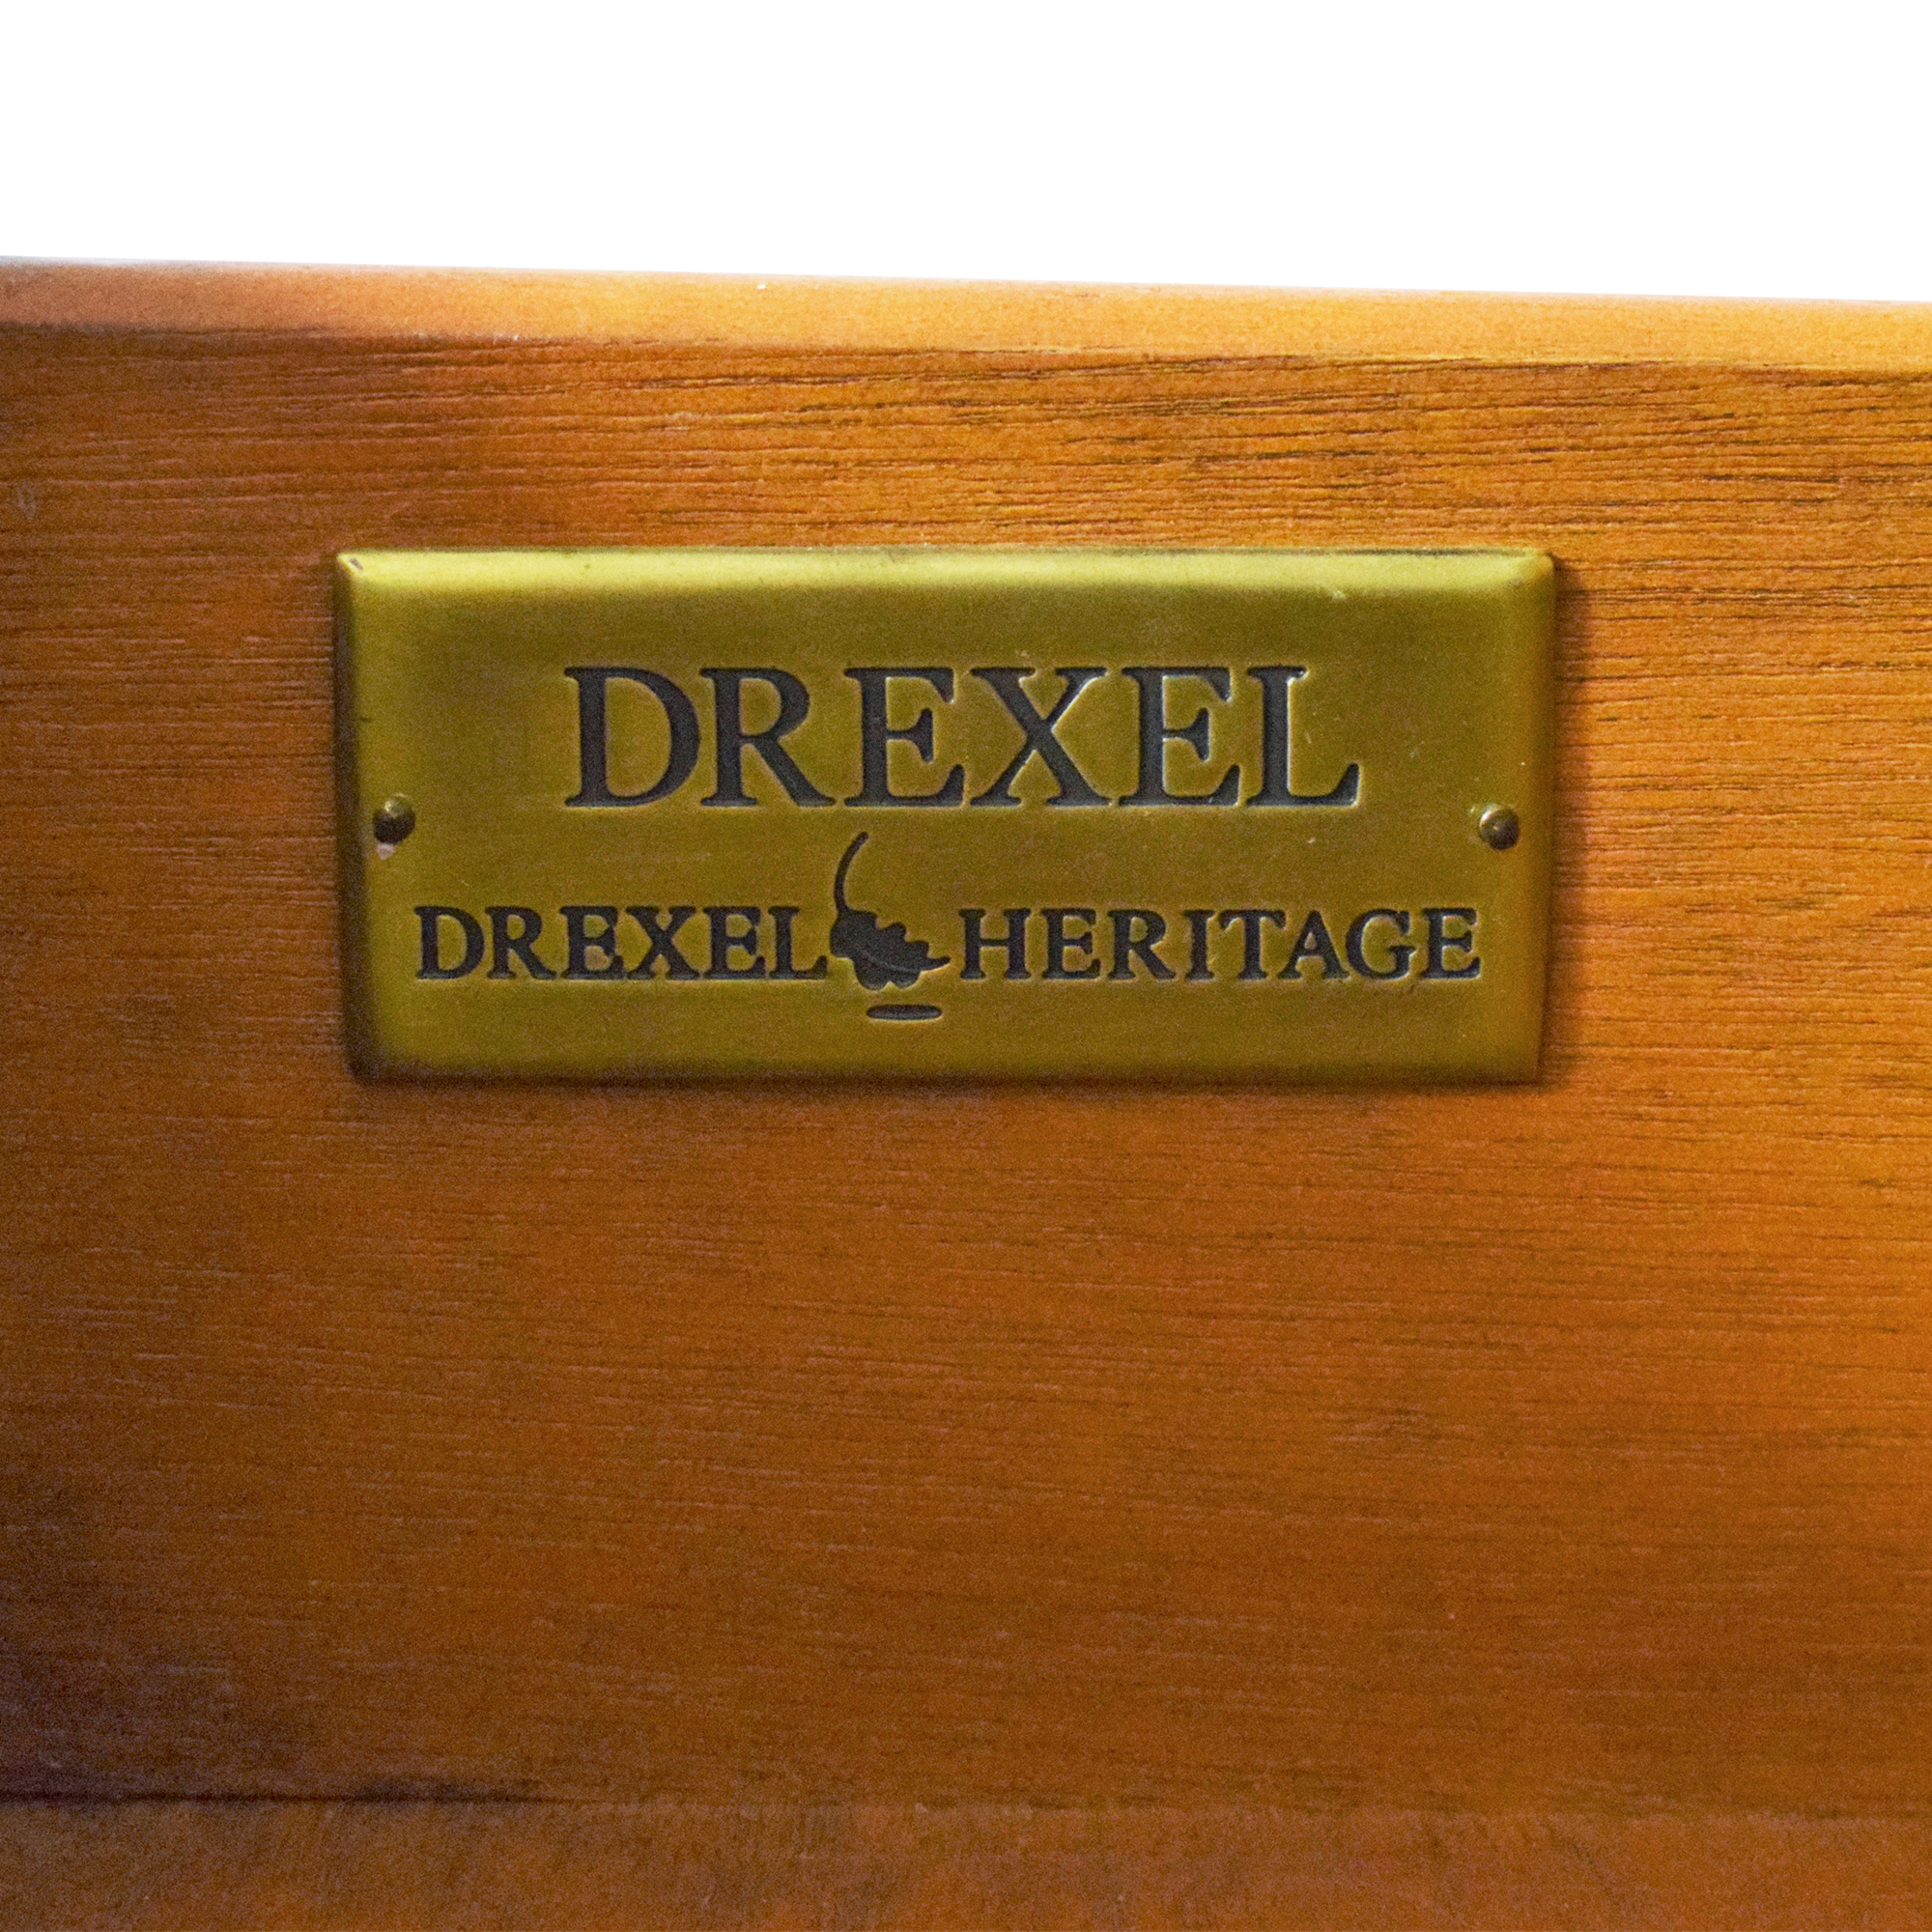 Drexel Heritage Drexel Heritage Carved Nightstand ct